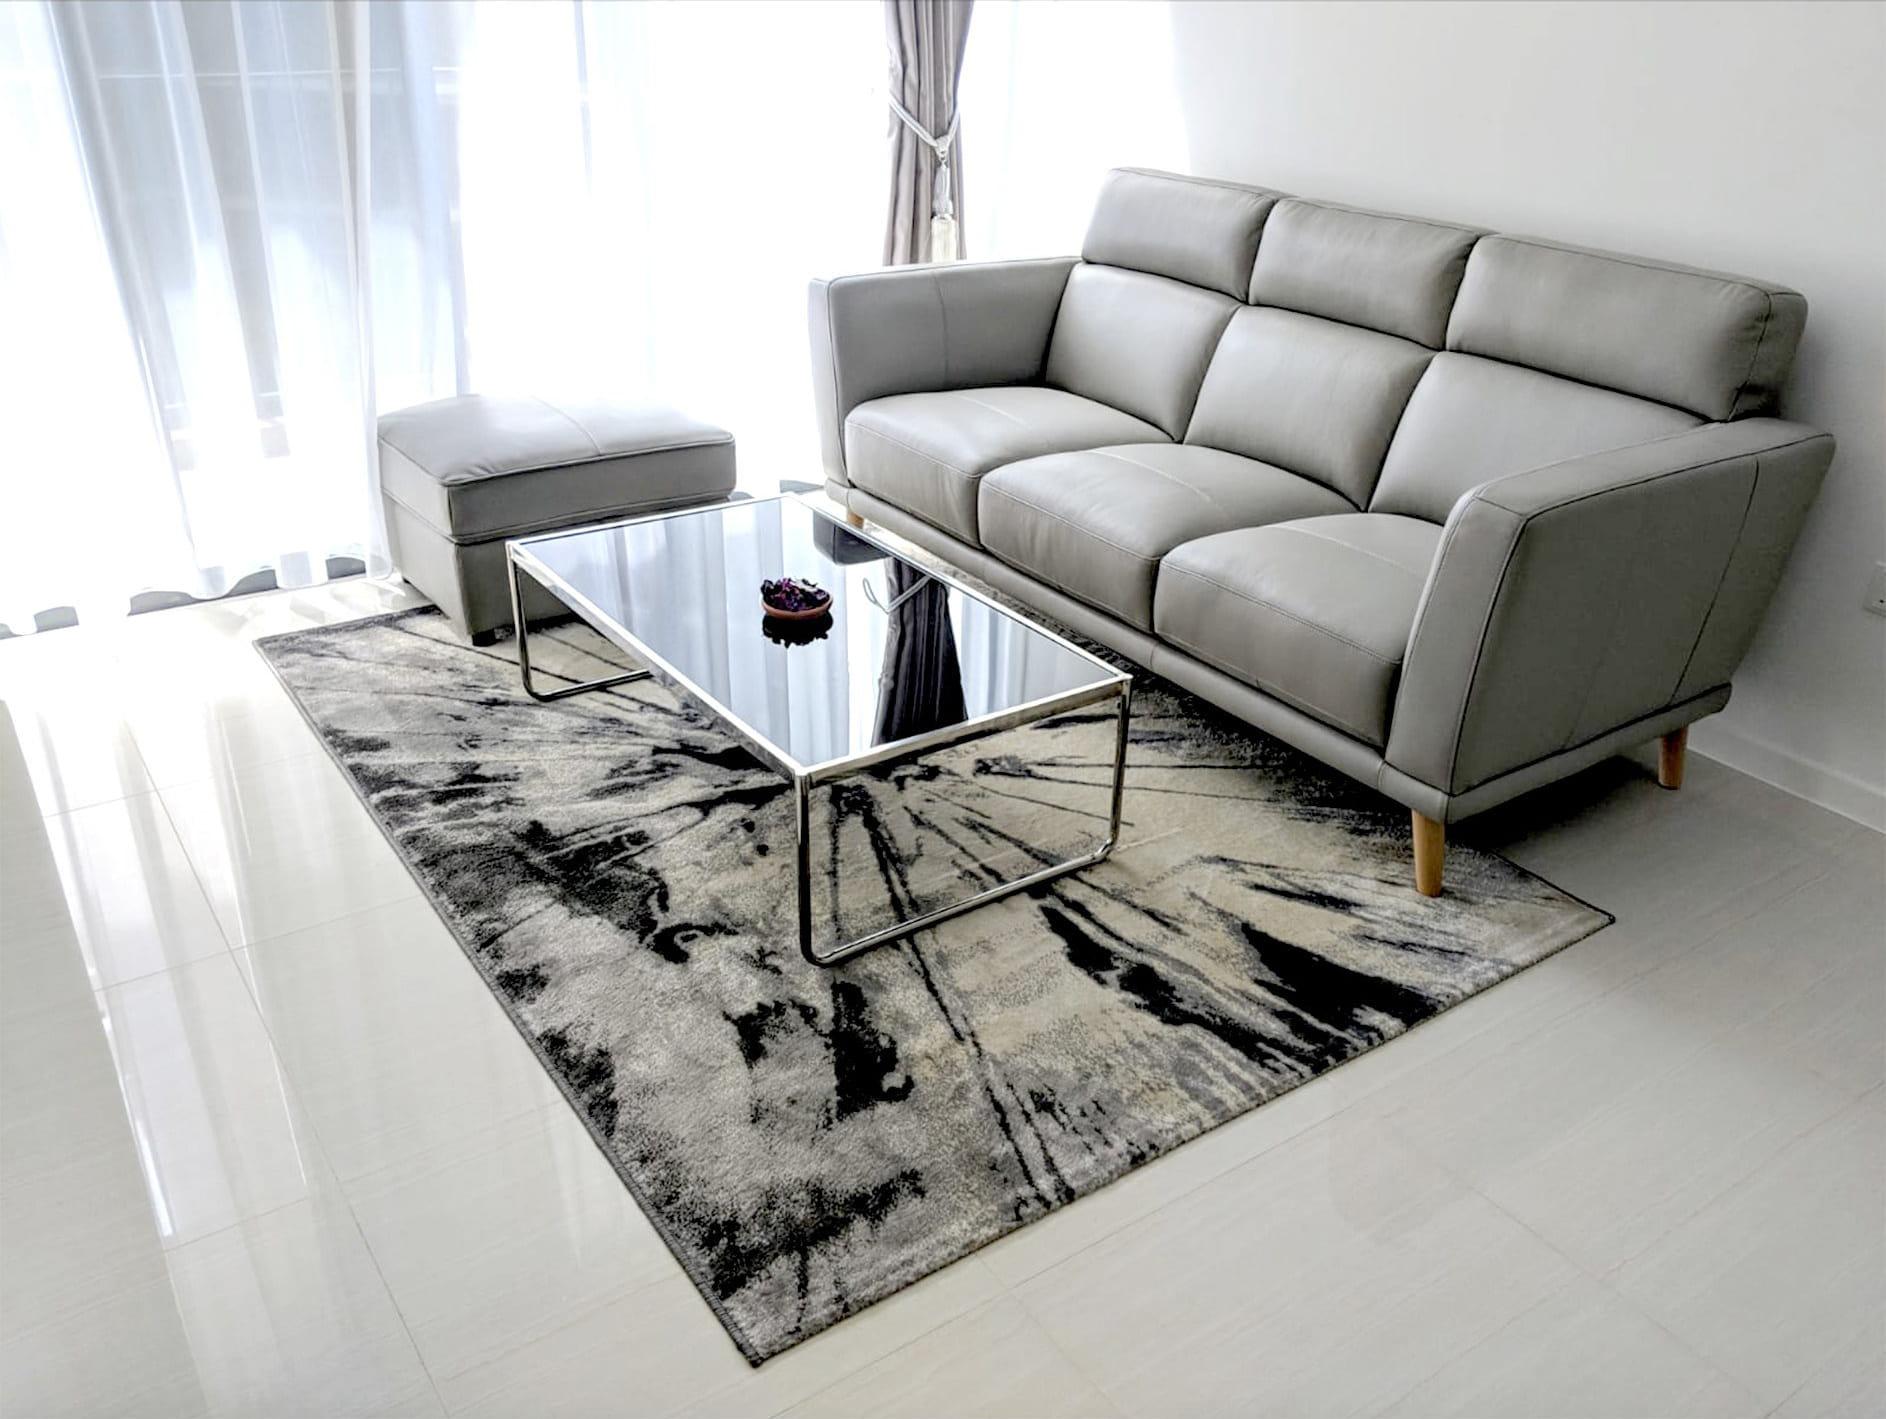 Modest Living Room Design for Minimalist Feel - Comfort Furniture